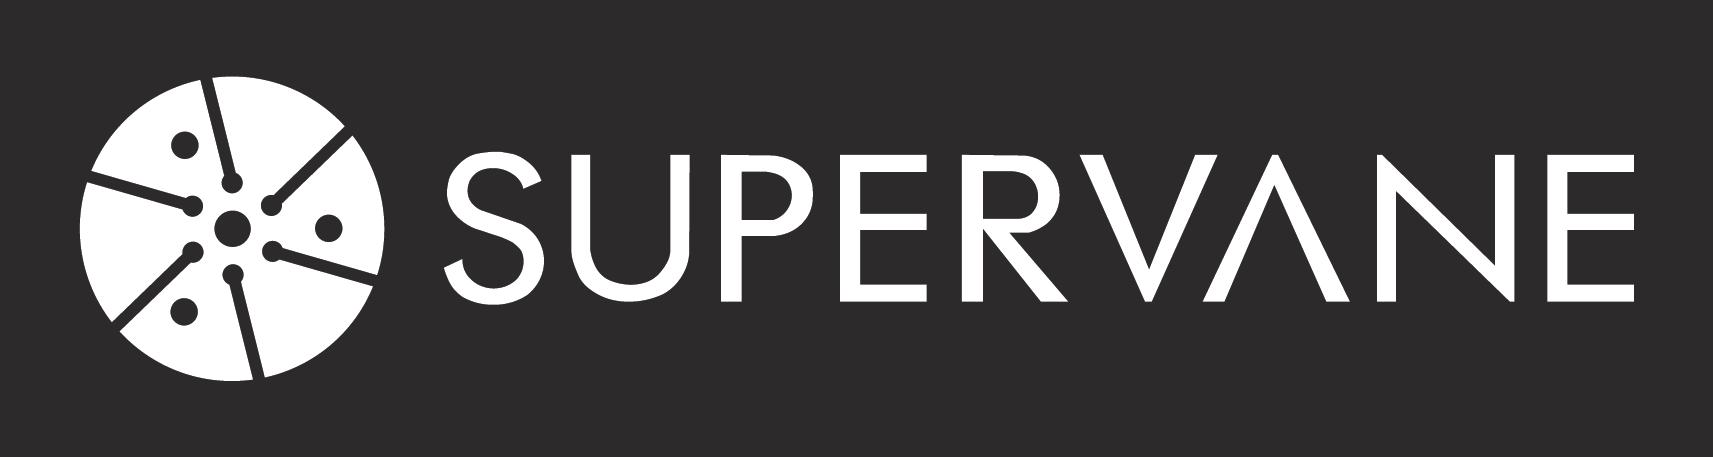 A logo for Supervane Carbon Vanes